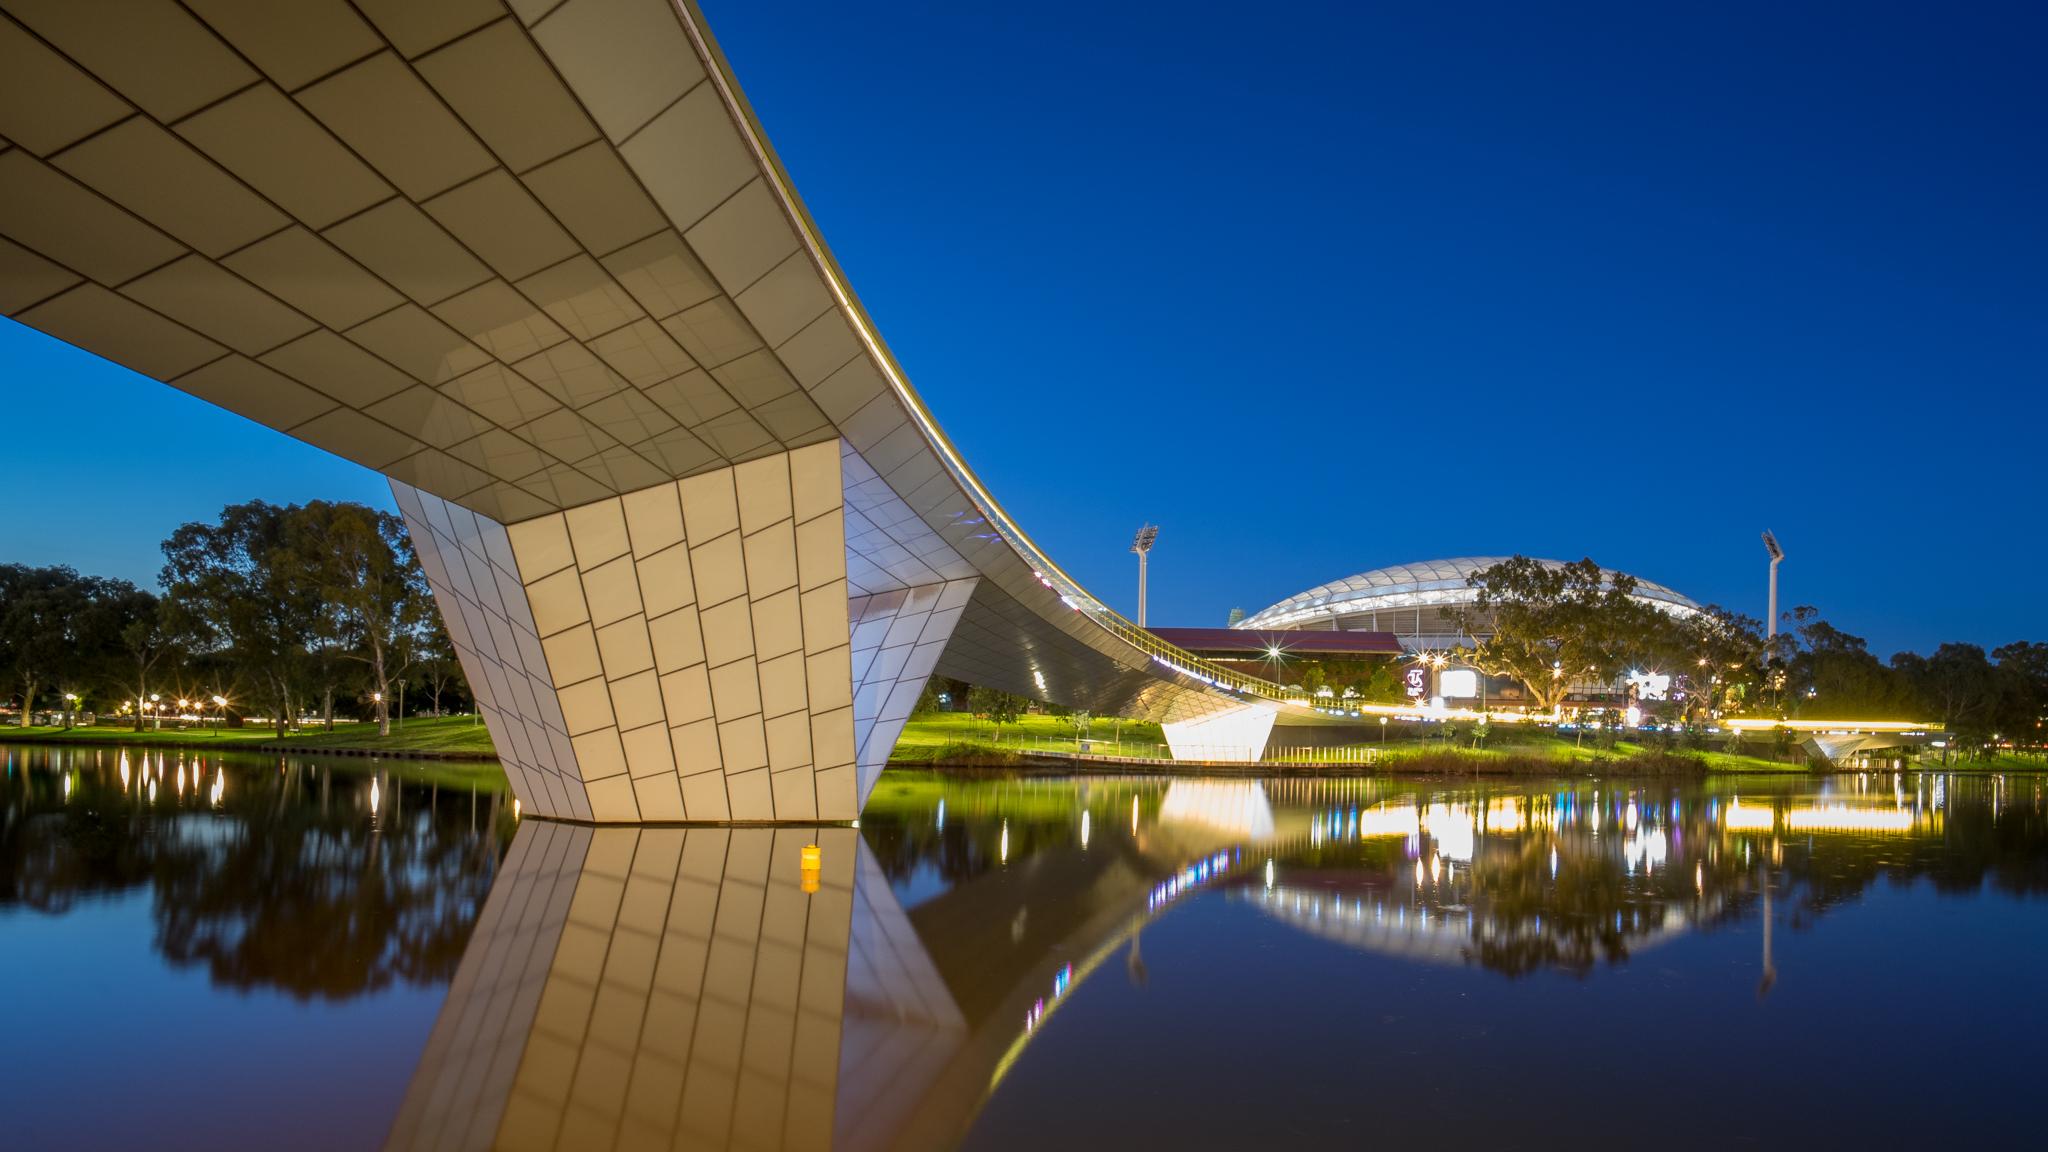 Adelaide Oval, River Torrens and footbridge, Australia